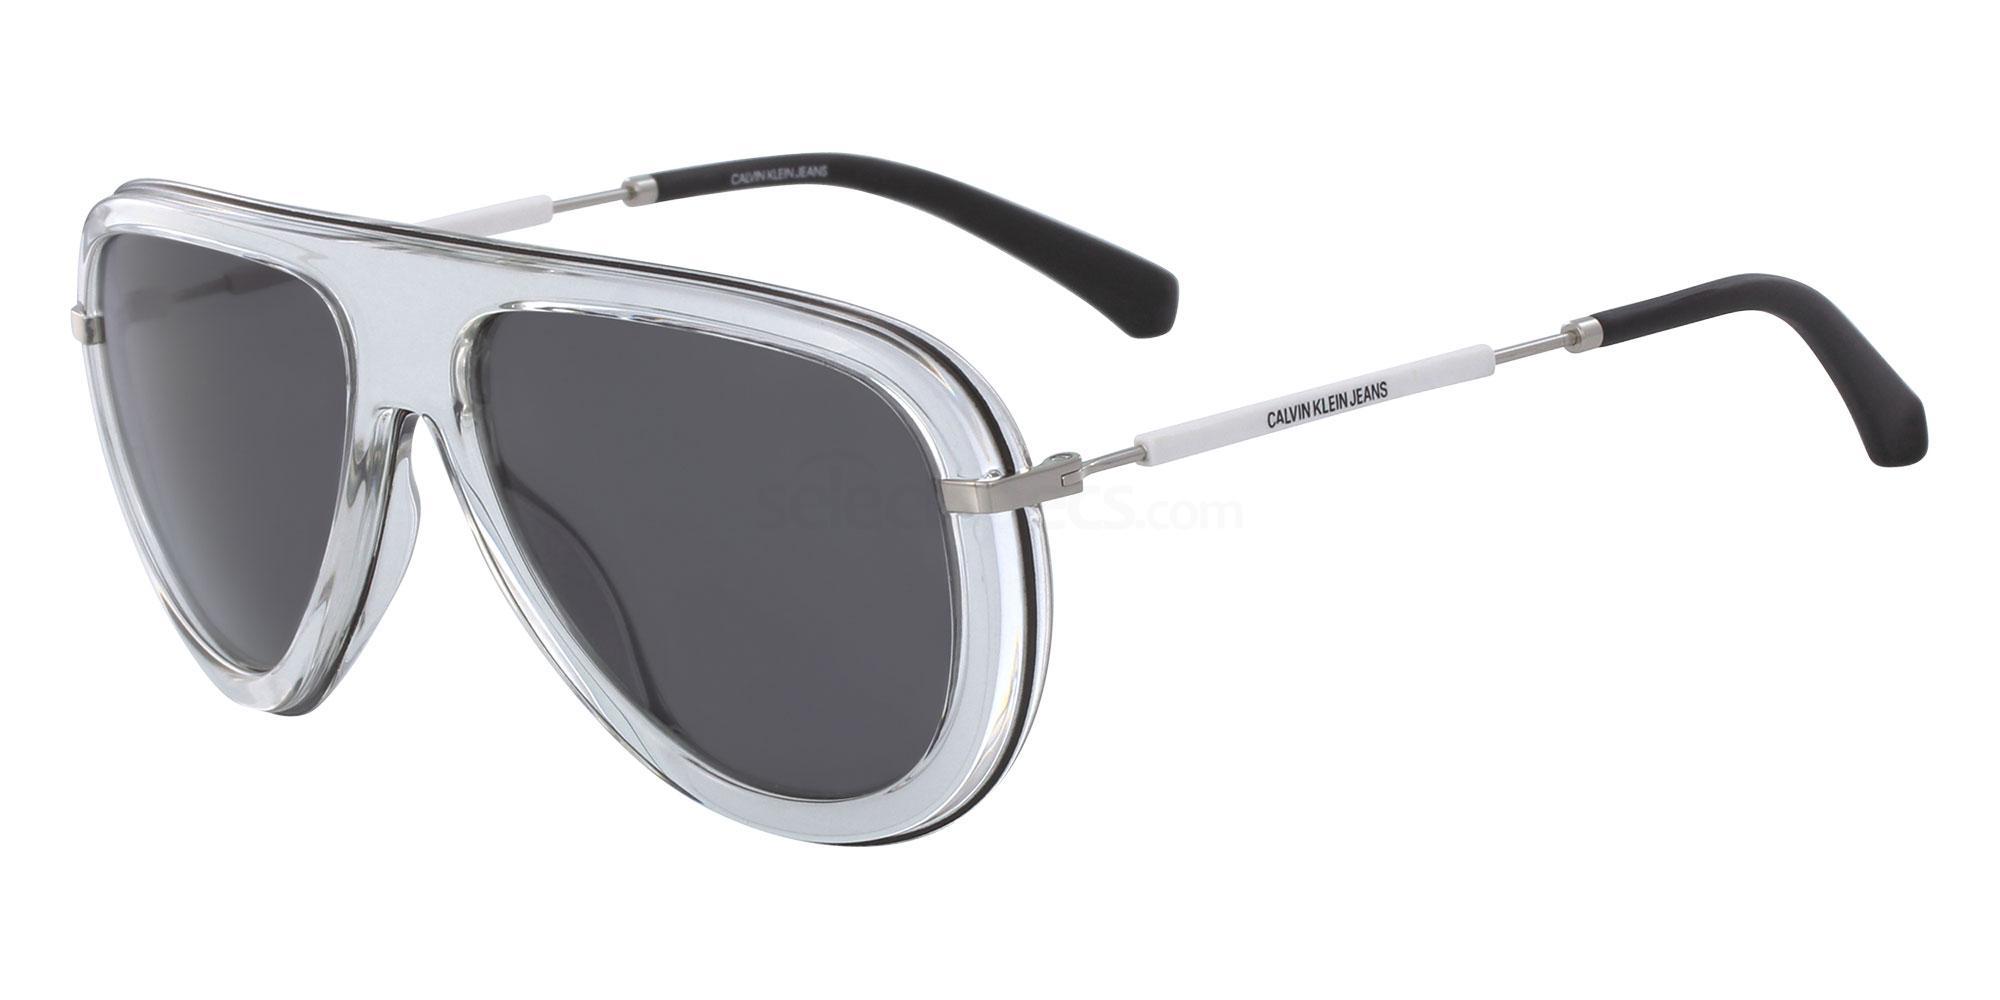 001 CKJ19704S Sunglasses, Calvin Klein Jeans